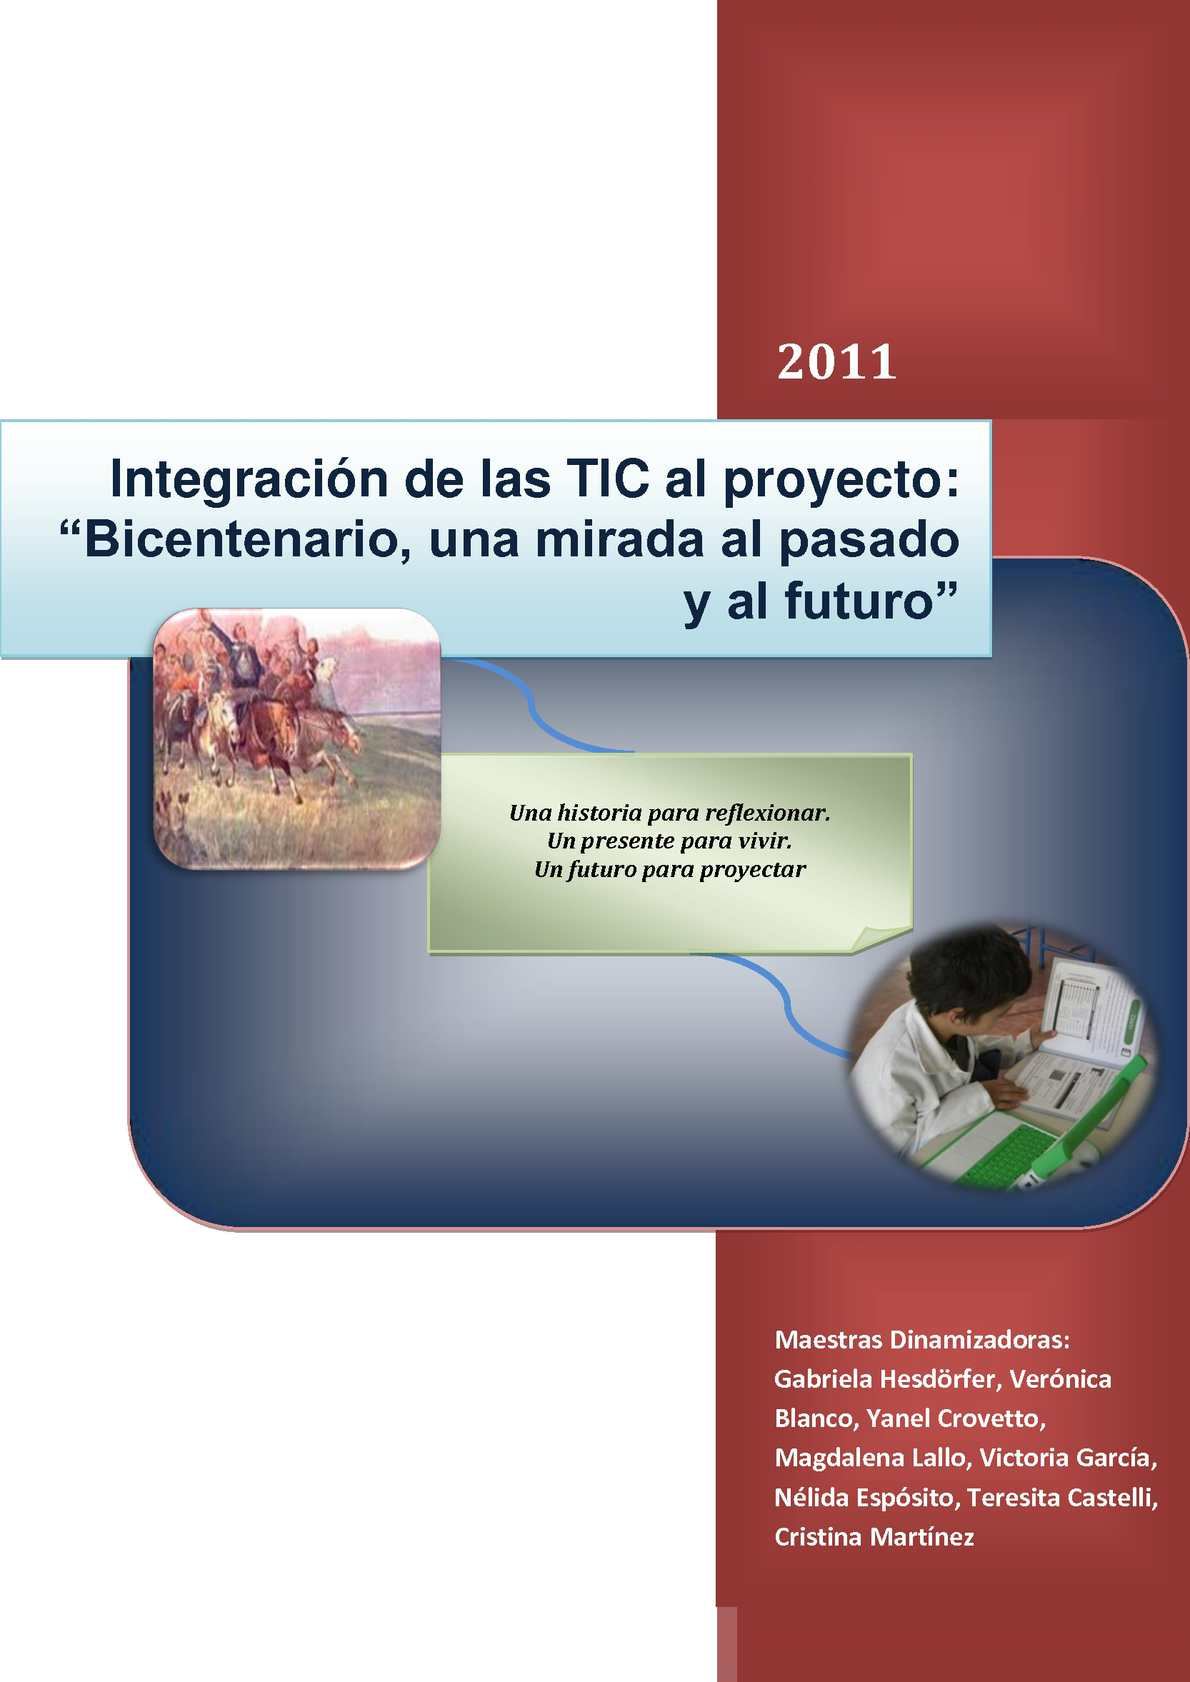 Calaméo - Selección de posibles actividades sobre el Bicentenario